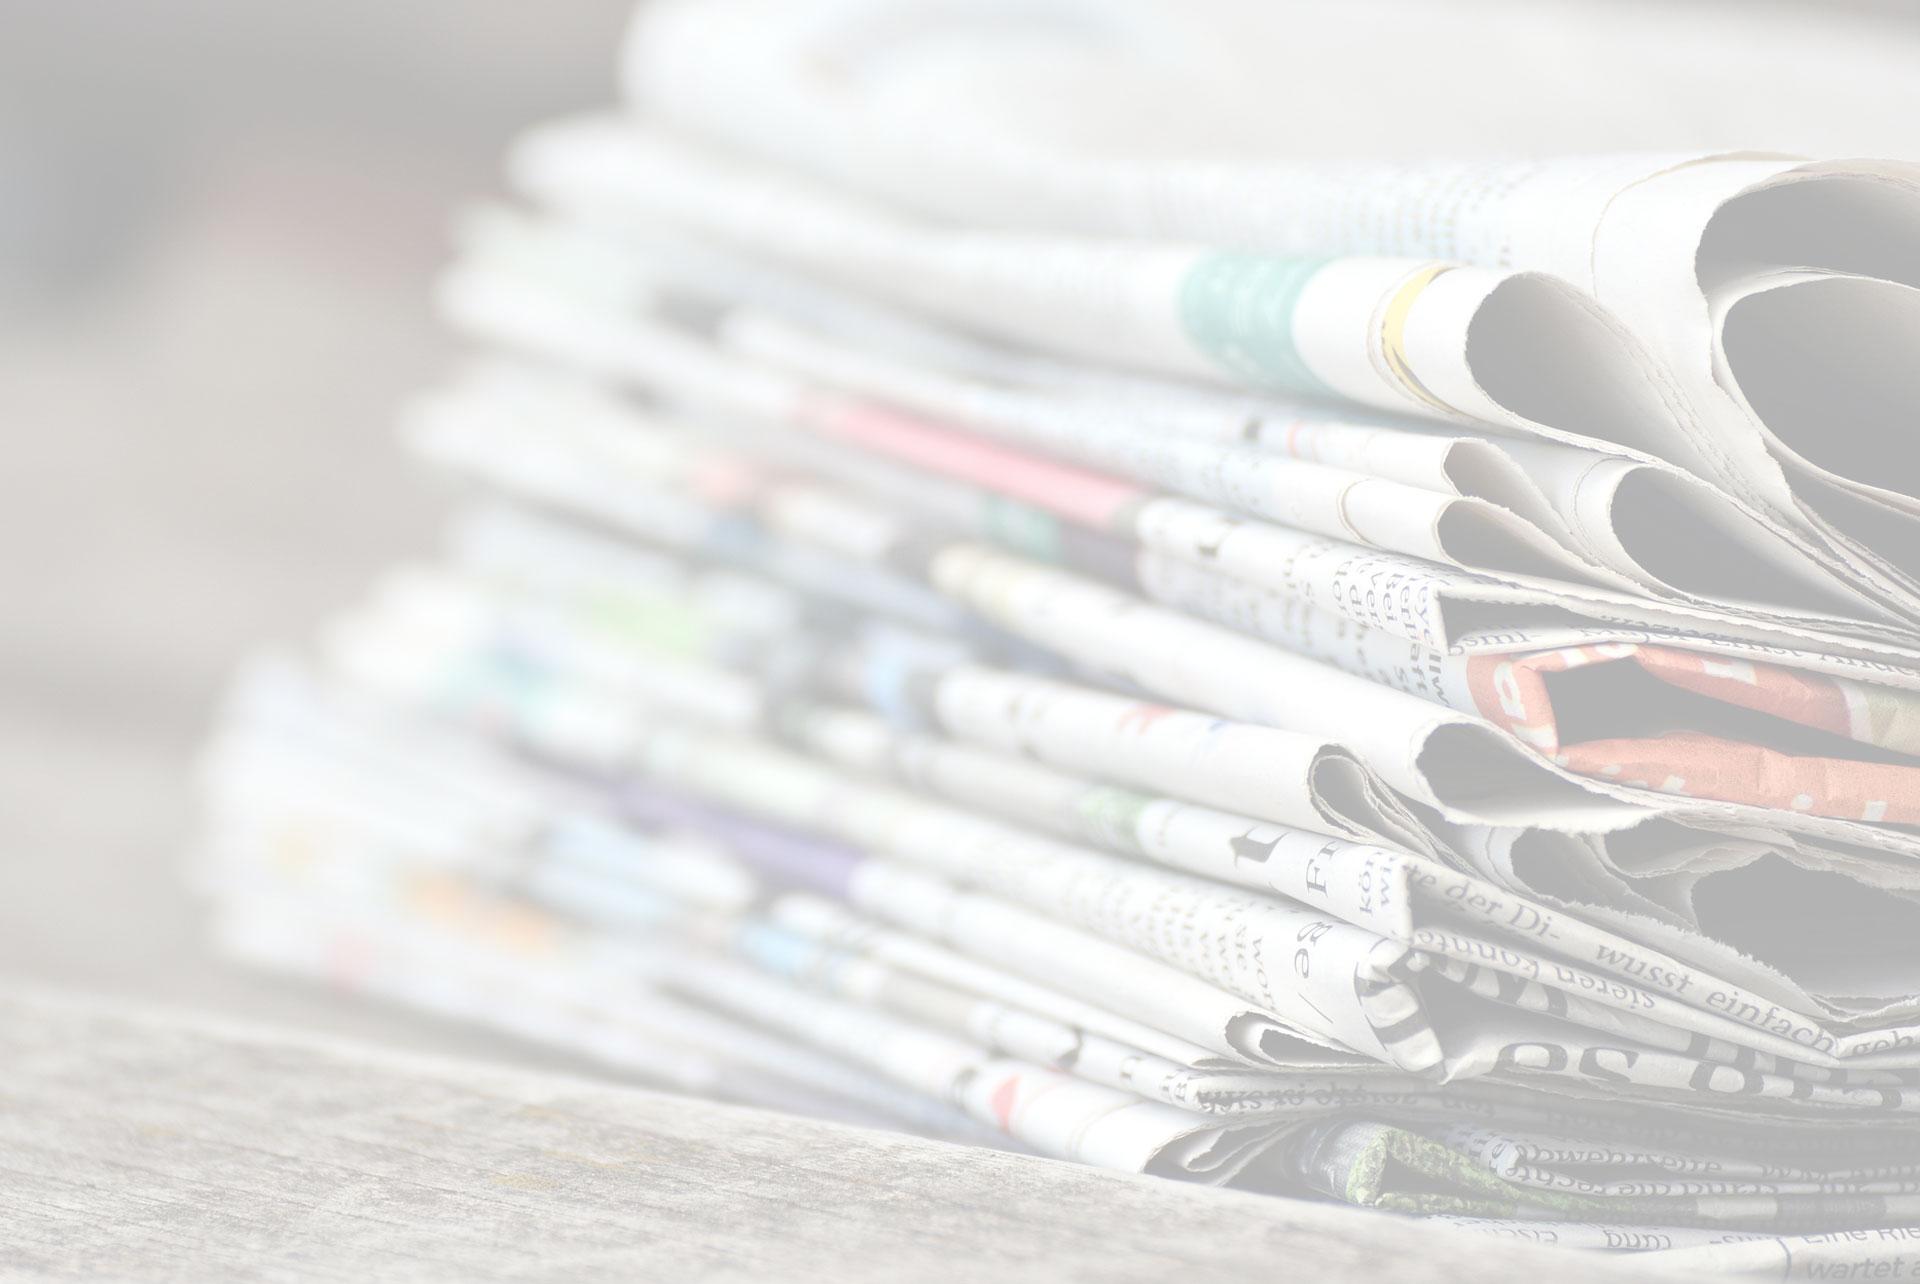 Computer Asus Malware